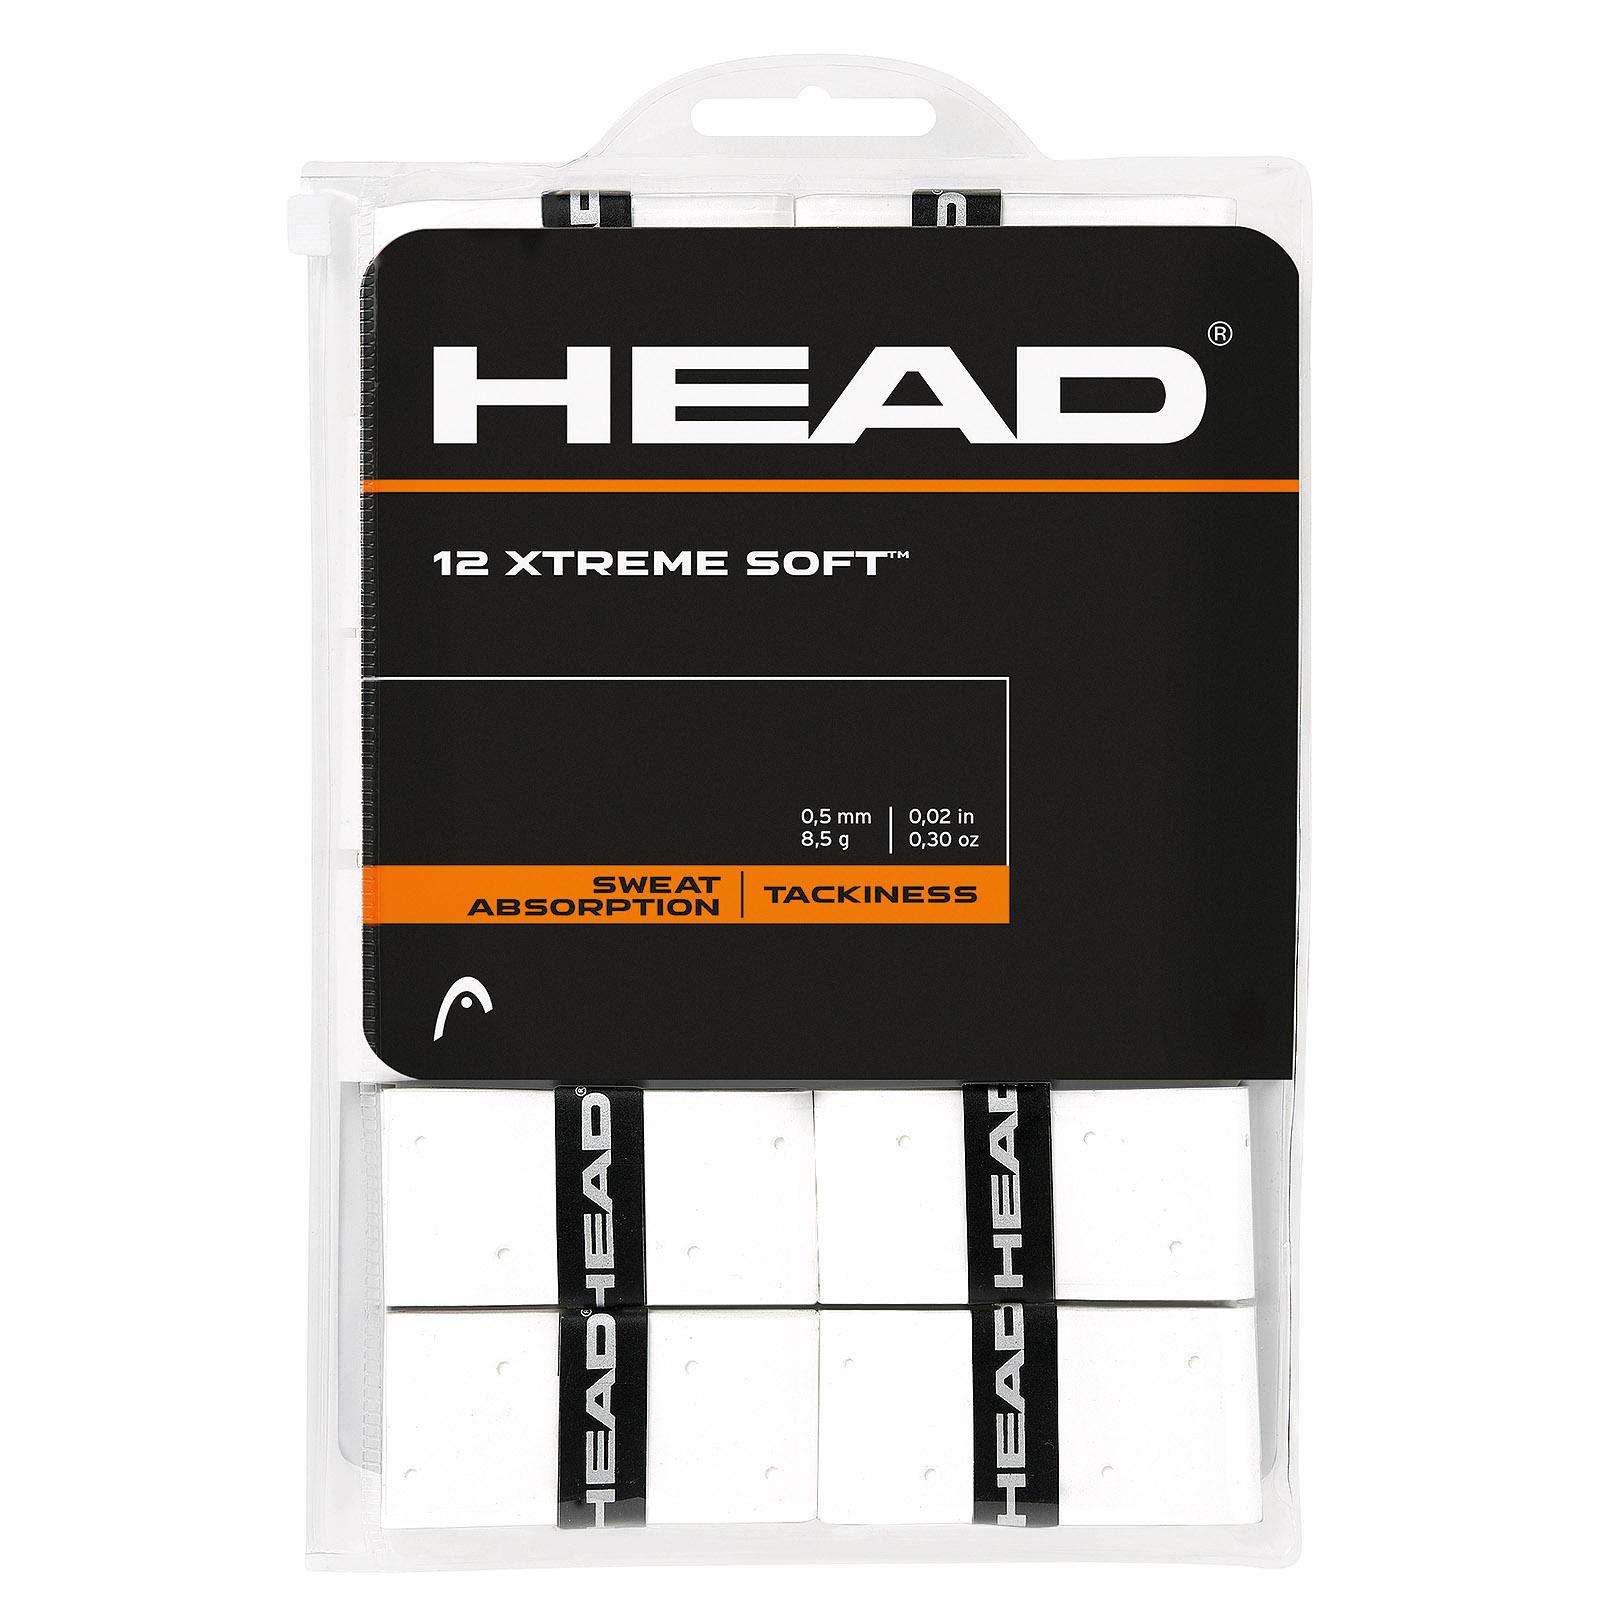 HEAD XtremeSoft 12x white